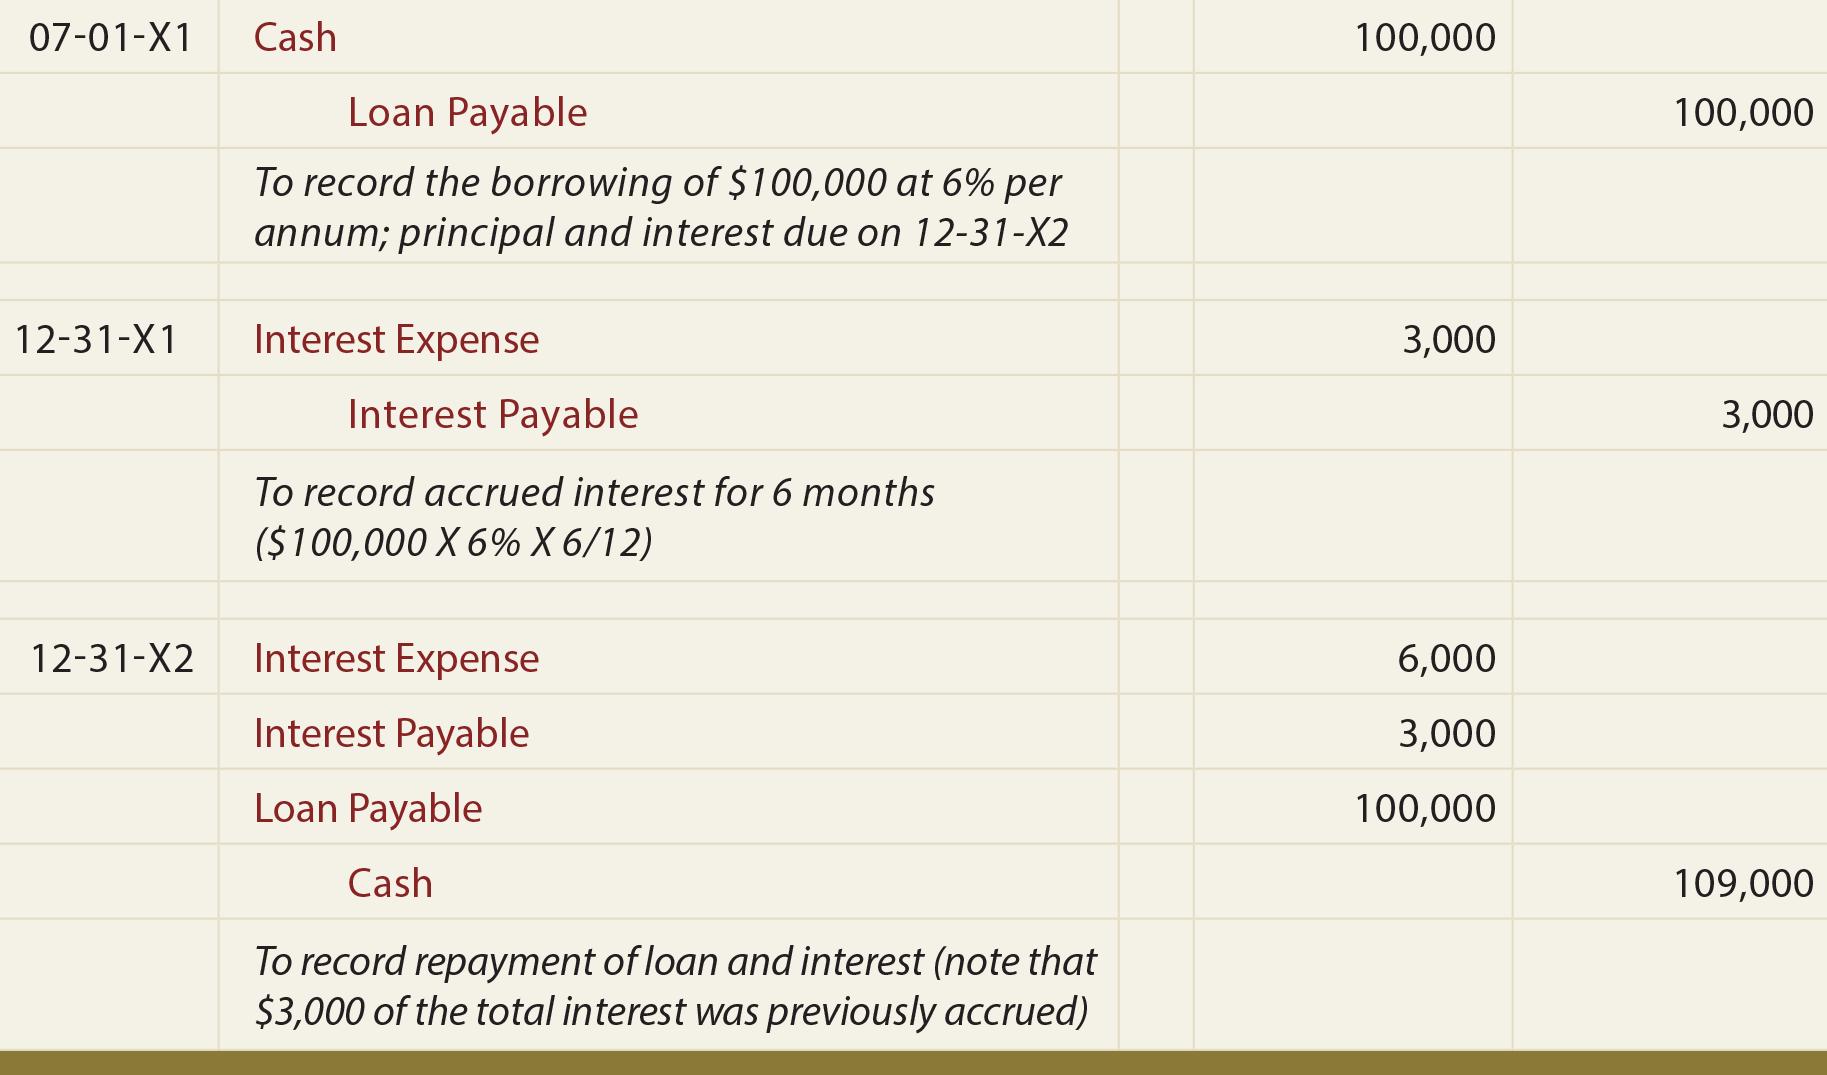 Loan Note Payable Borrow Accrued Interest And Repay Principlesofaccounting Com